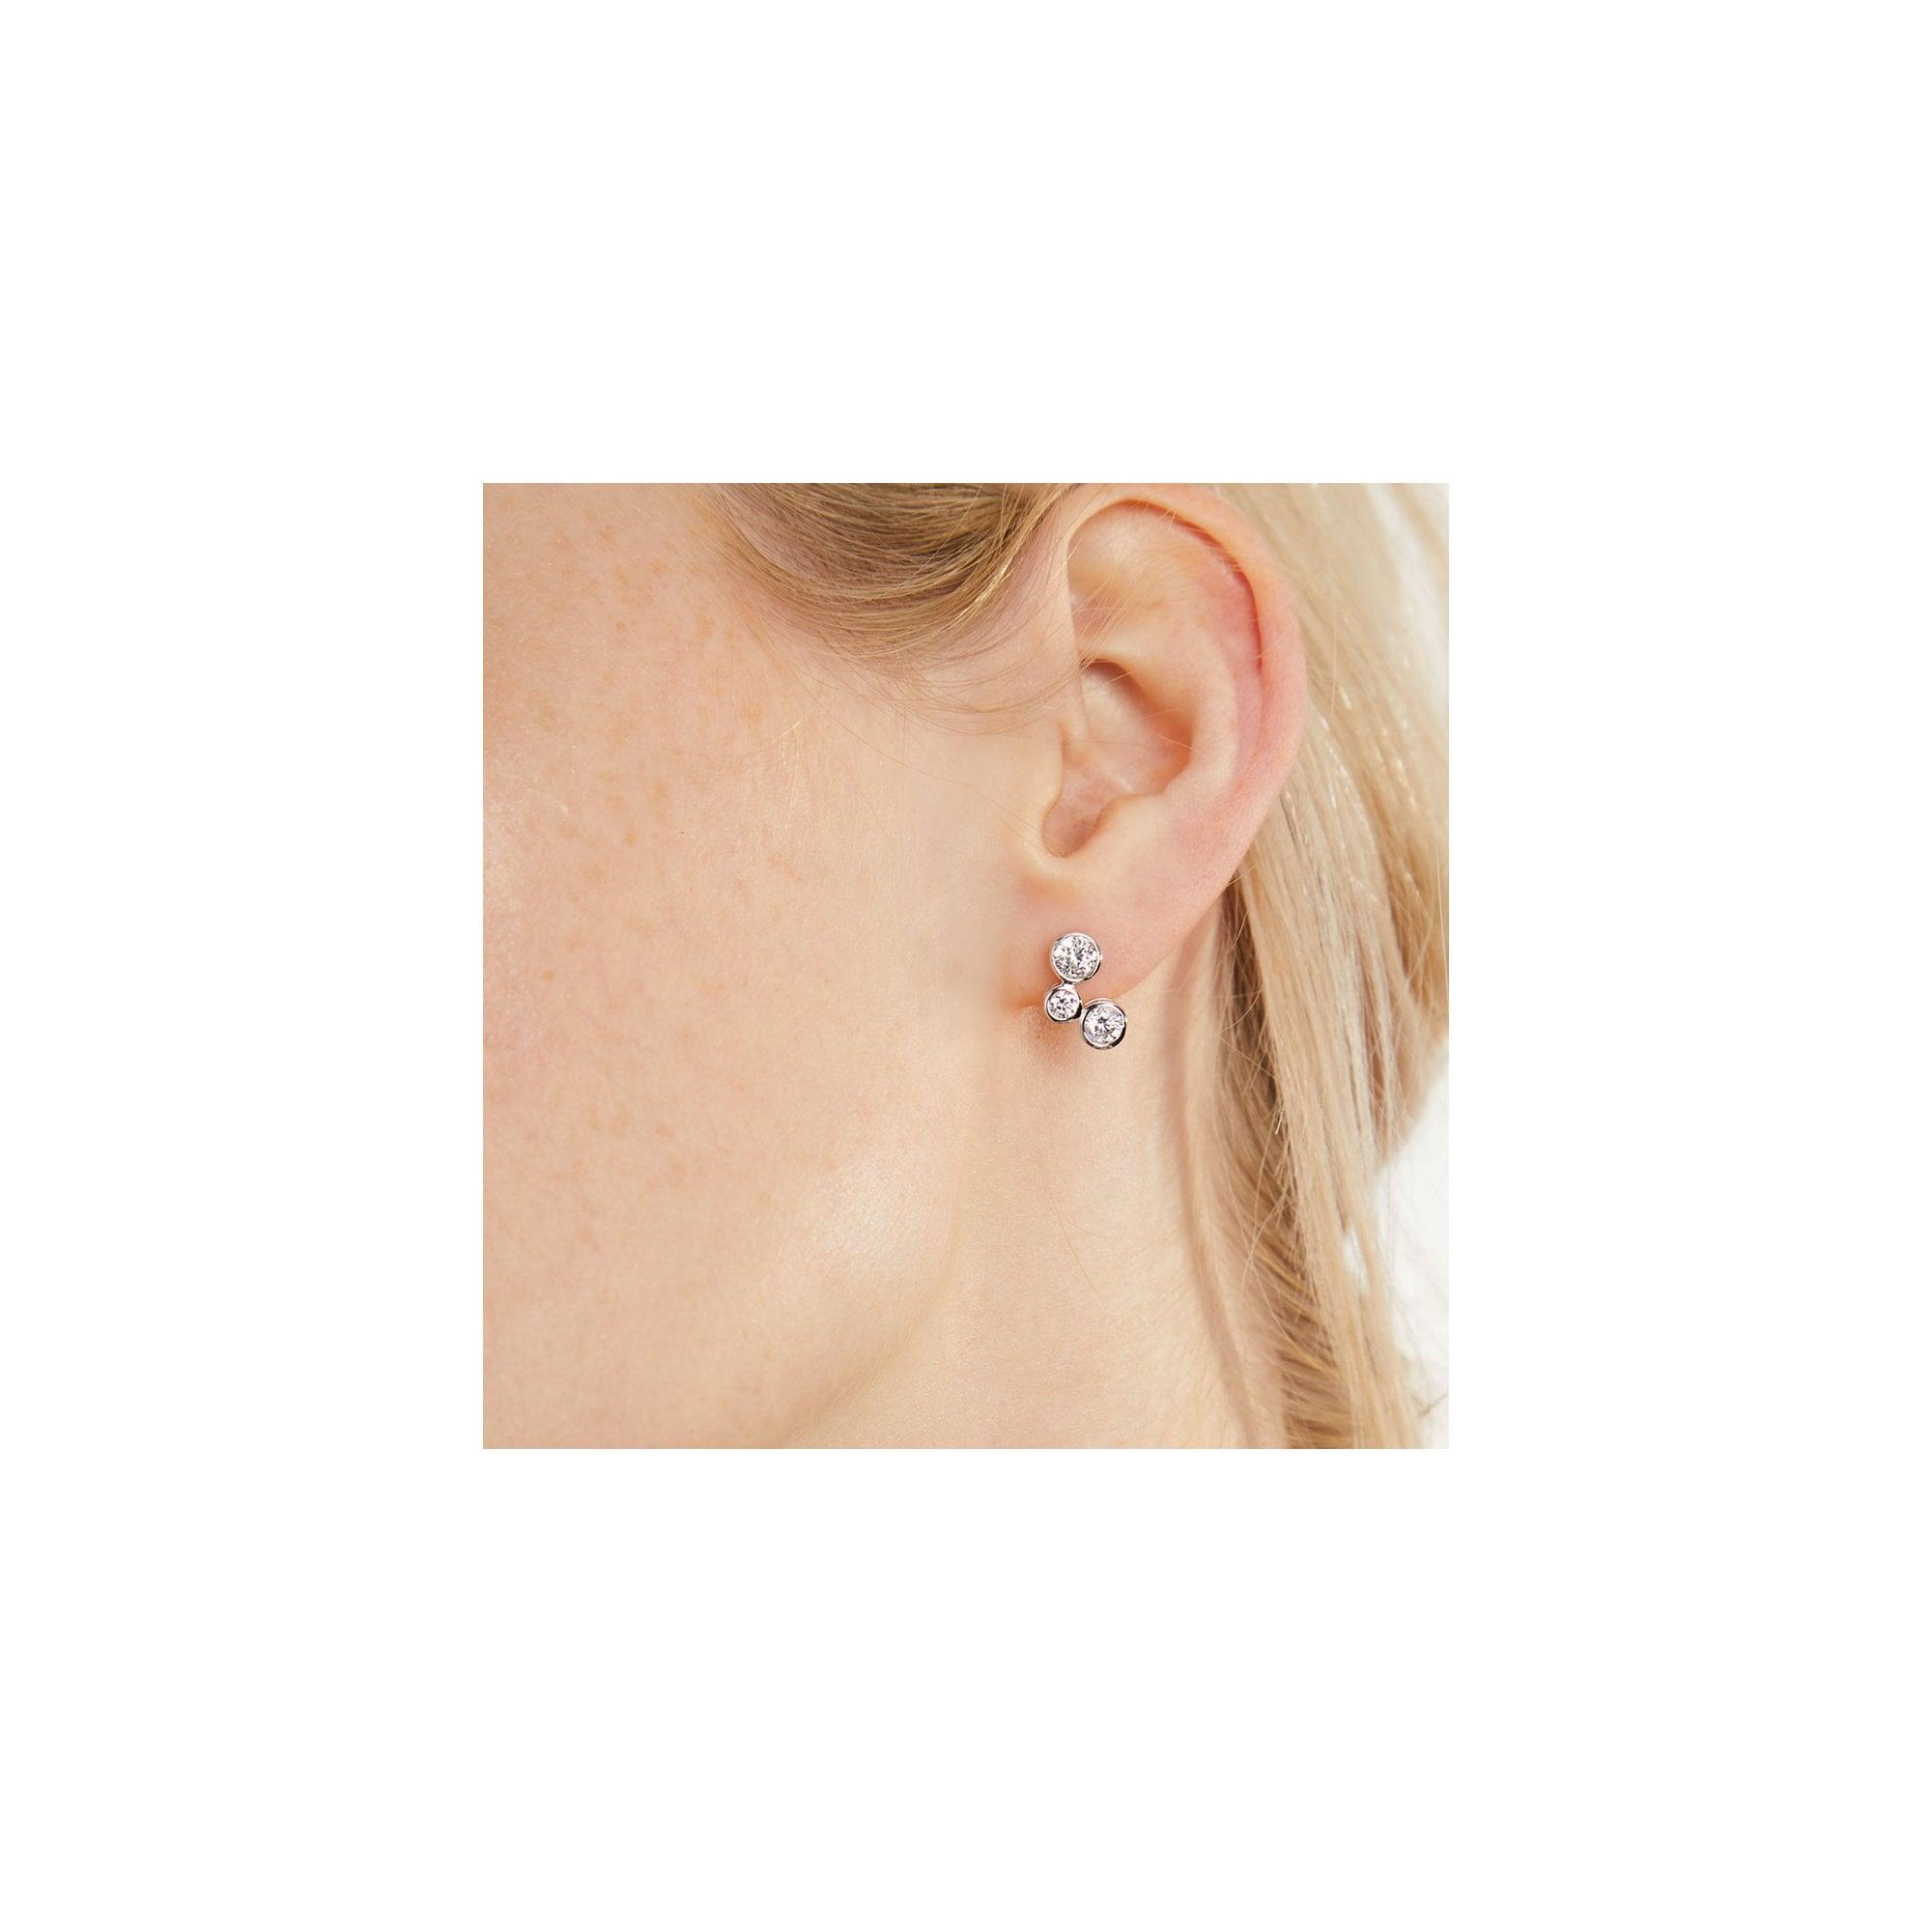 Jools By Jenny Brown Silver And Cubic Zirconia Bubble Raindance Stud Earrings Kpe1628 Silver From Avanti Of Ashbourne Ltd Uk